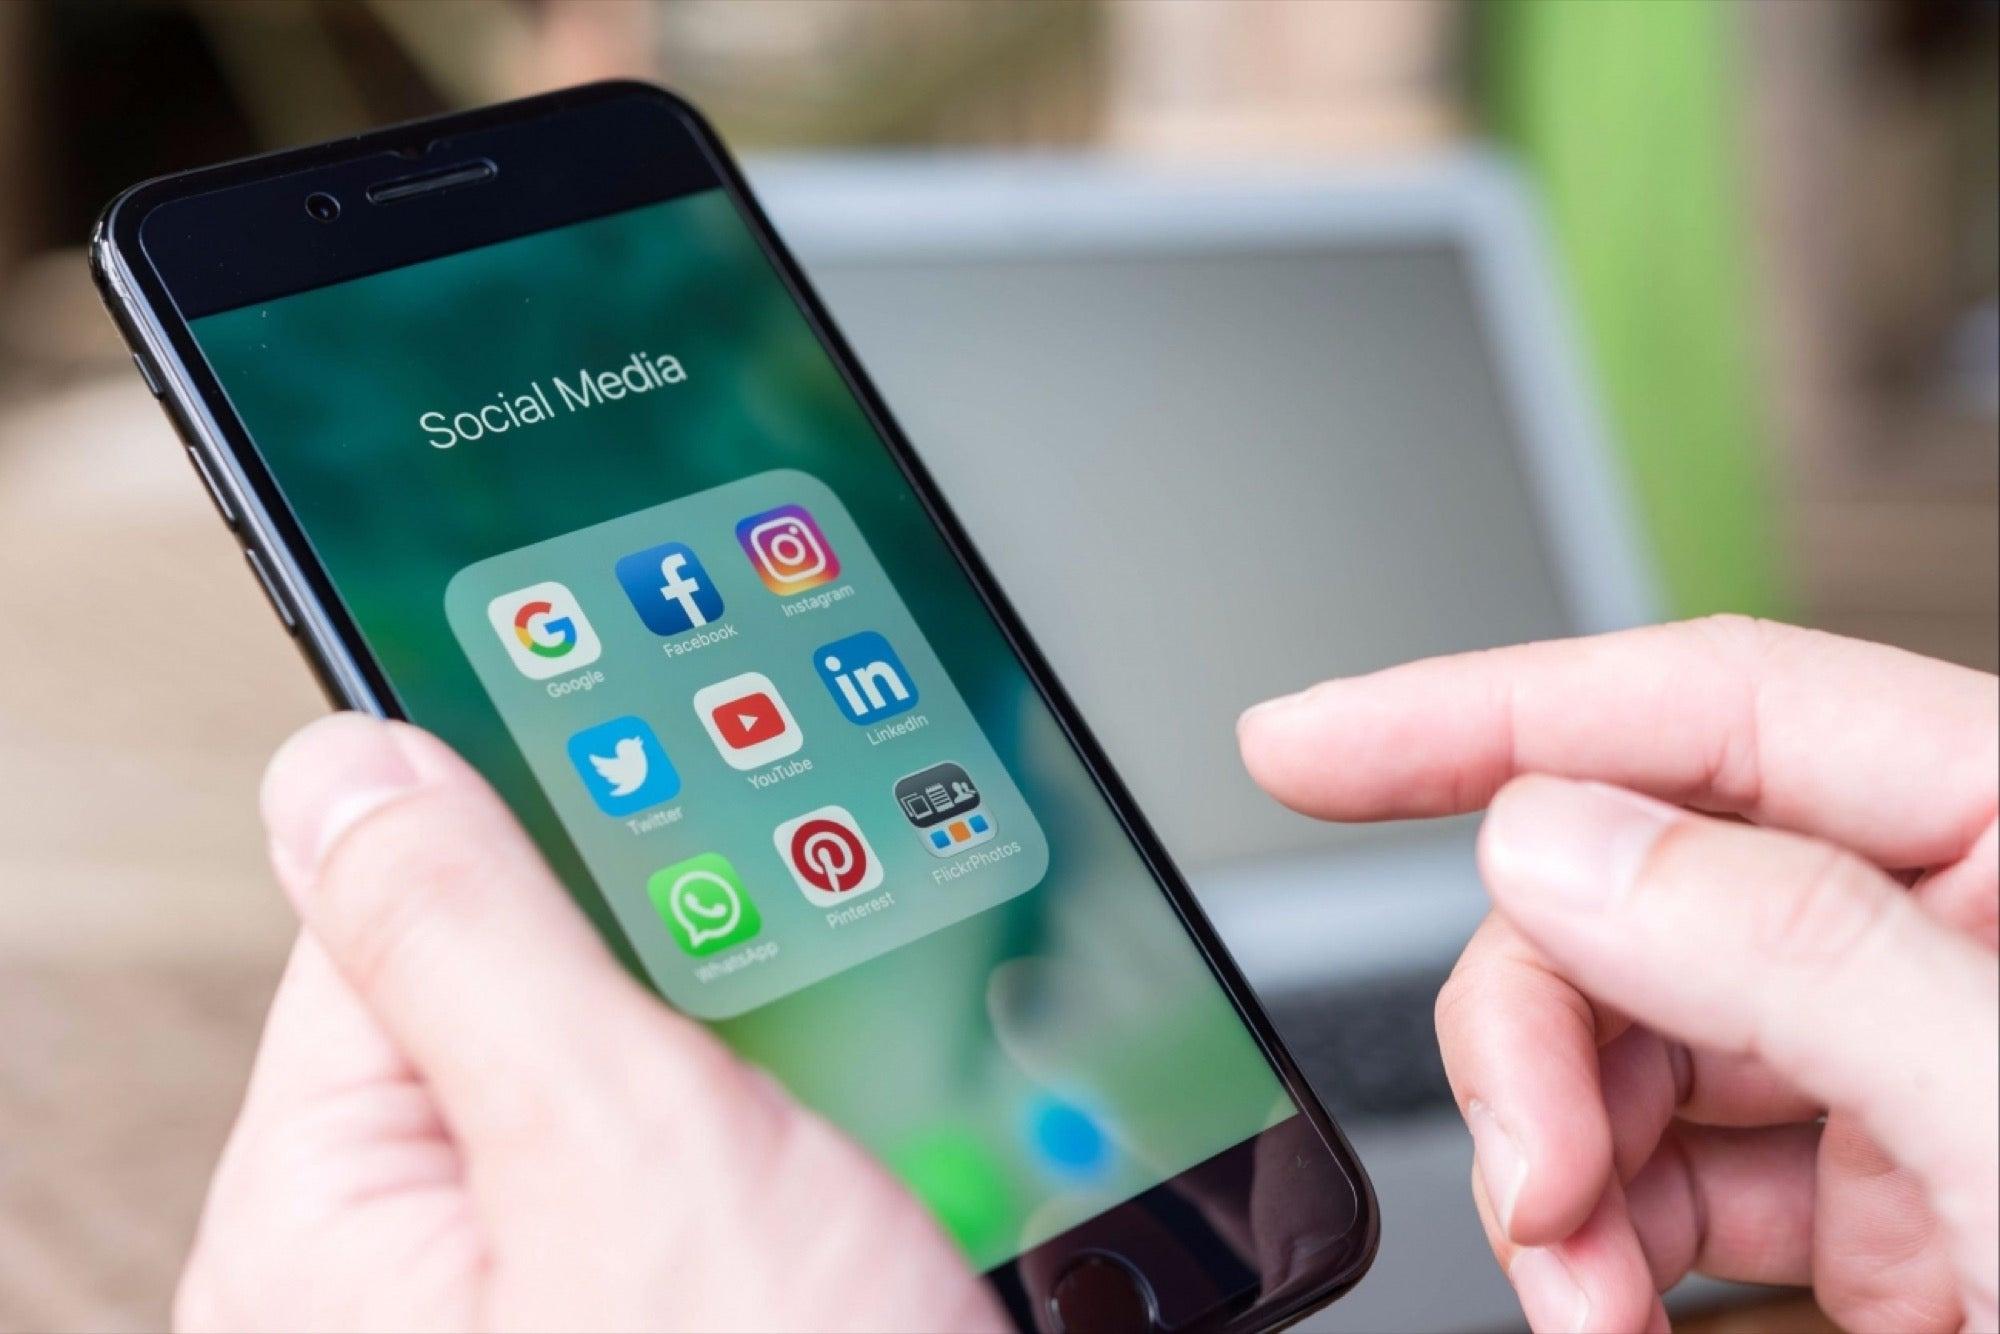 entrepreneur.com - Sania Gupta - Is the Era of Social Media Marketing Declining?